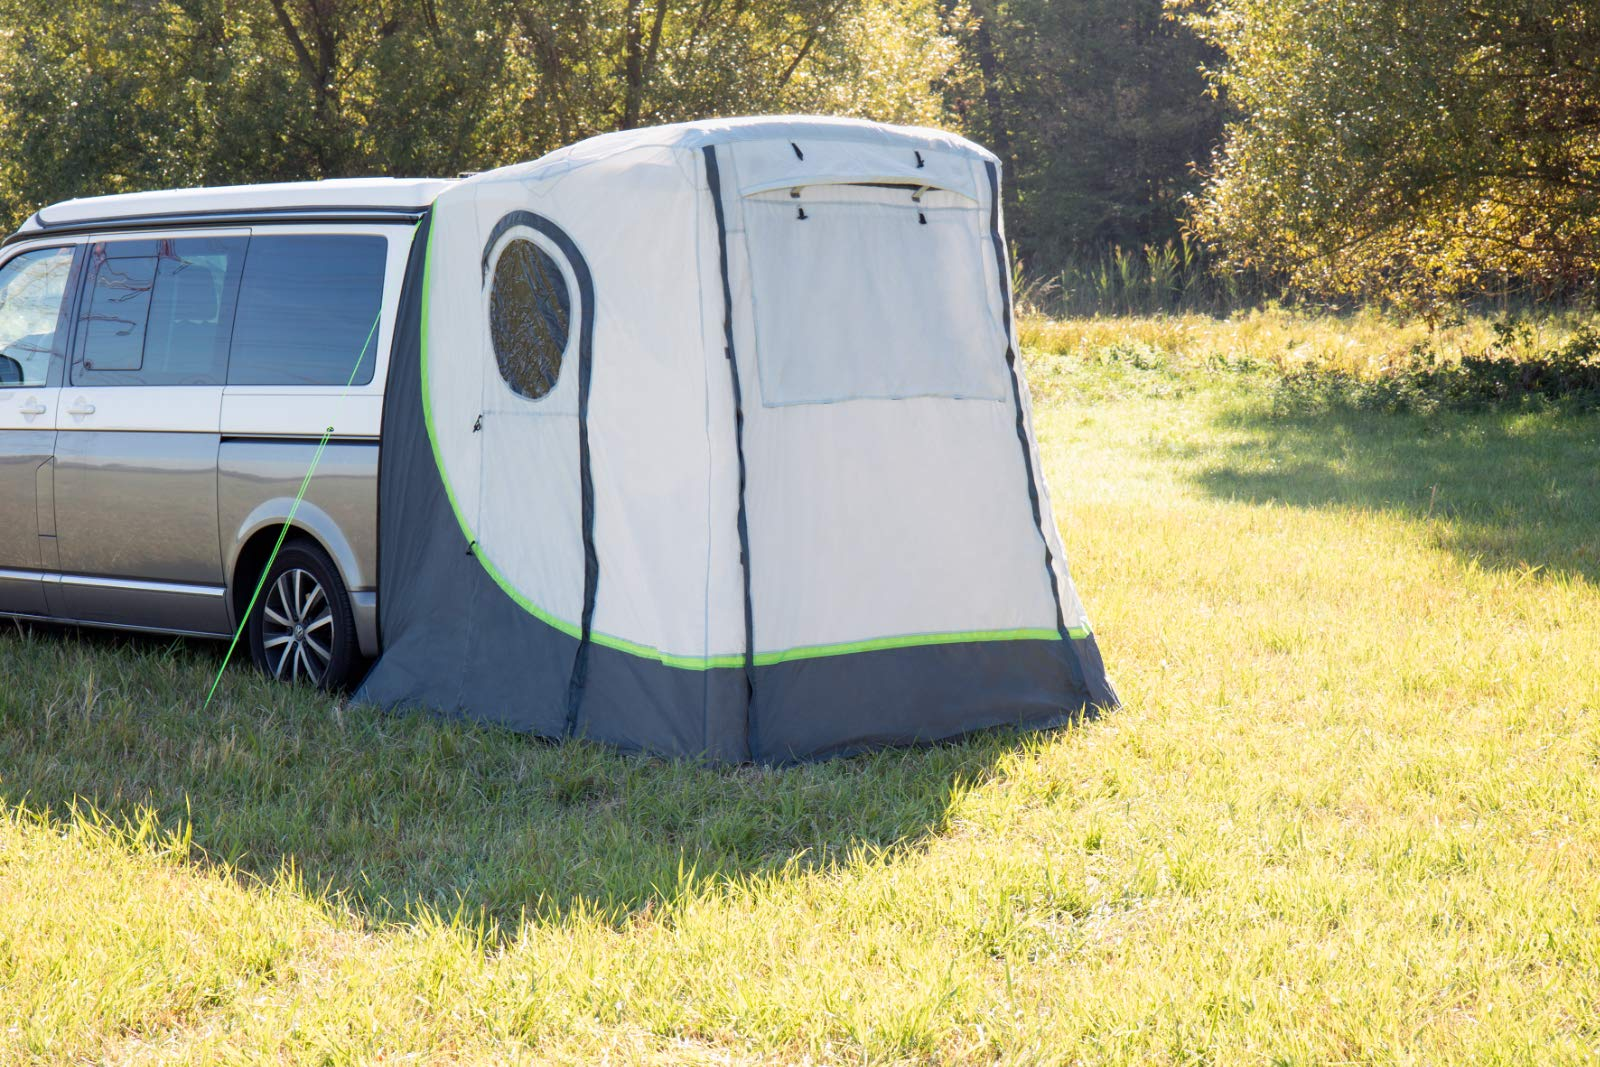 Reimo Rear Tent Upgrade Premium Travel Tent 195 x 200 for ...